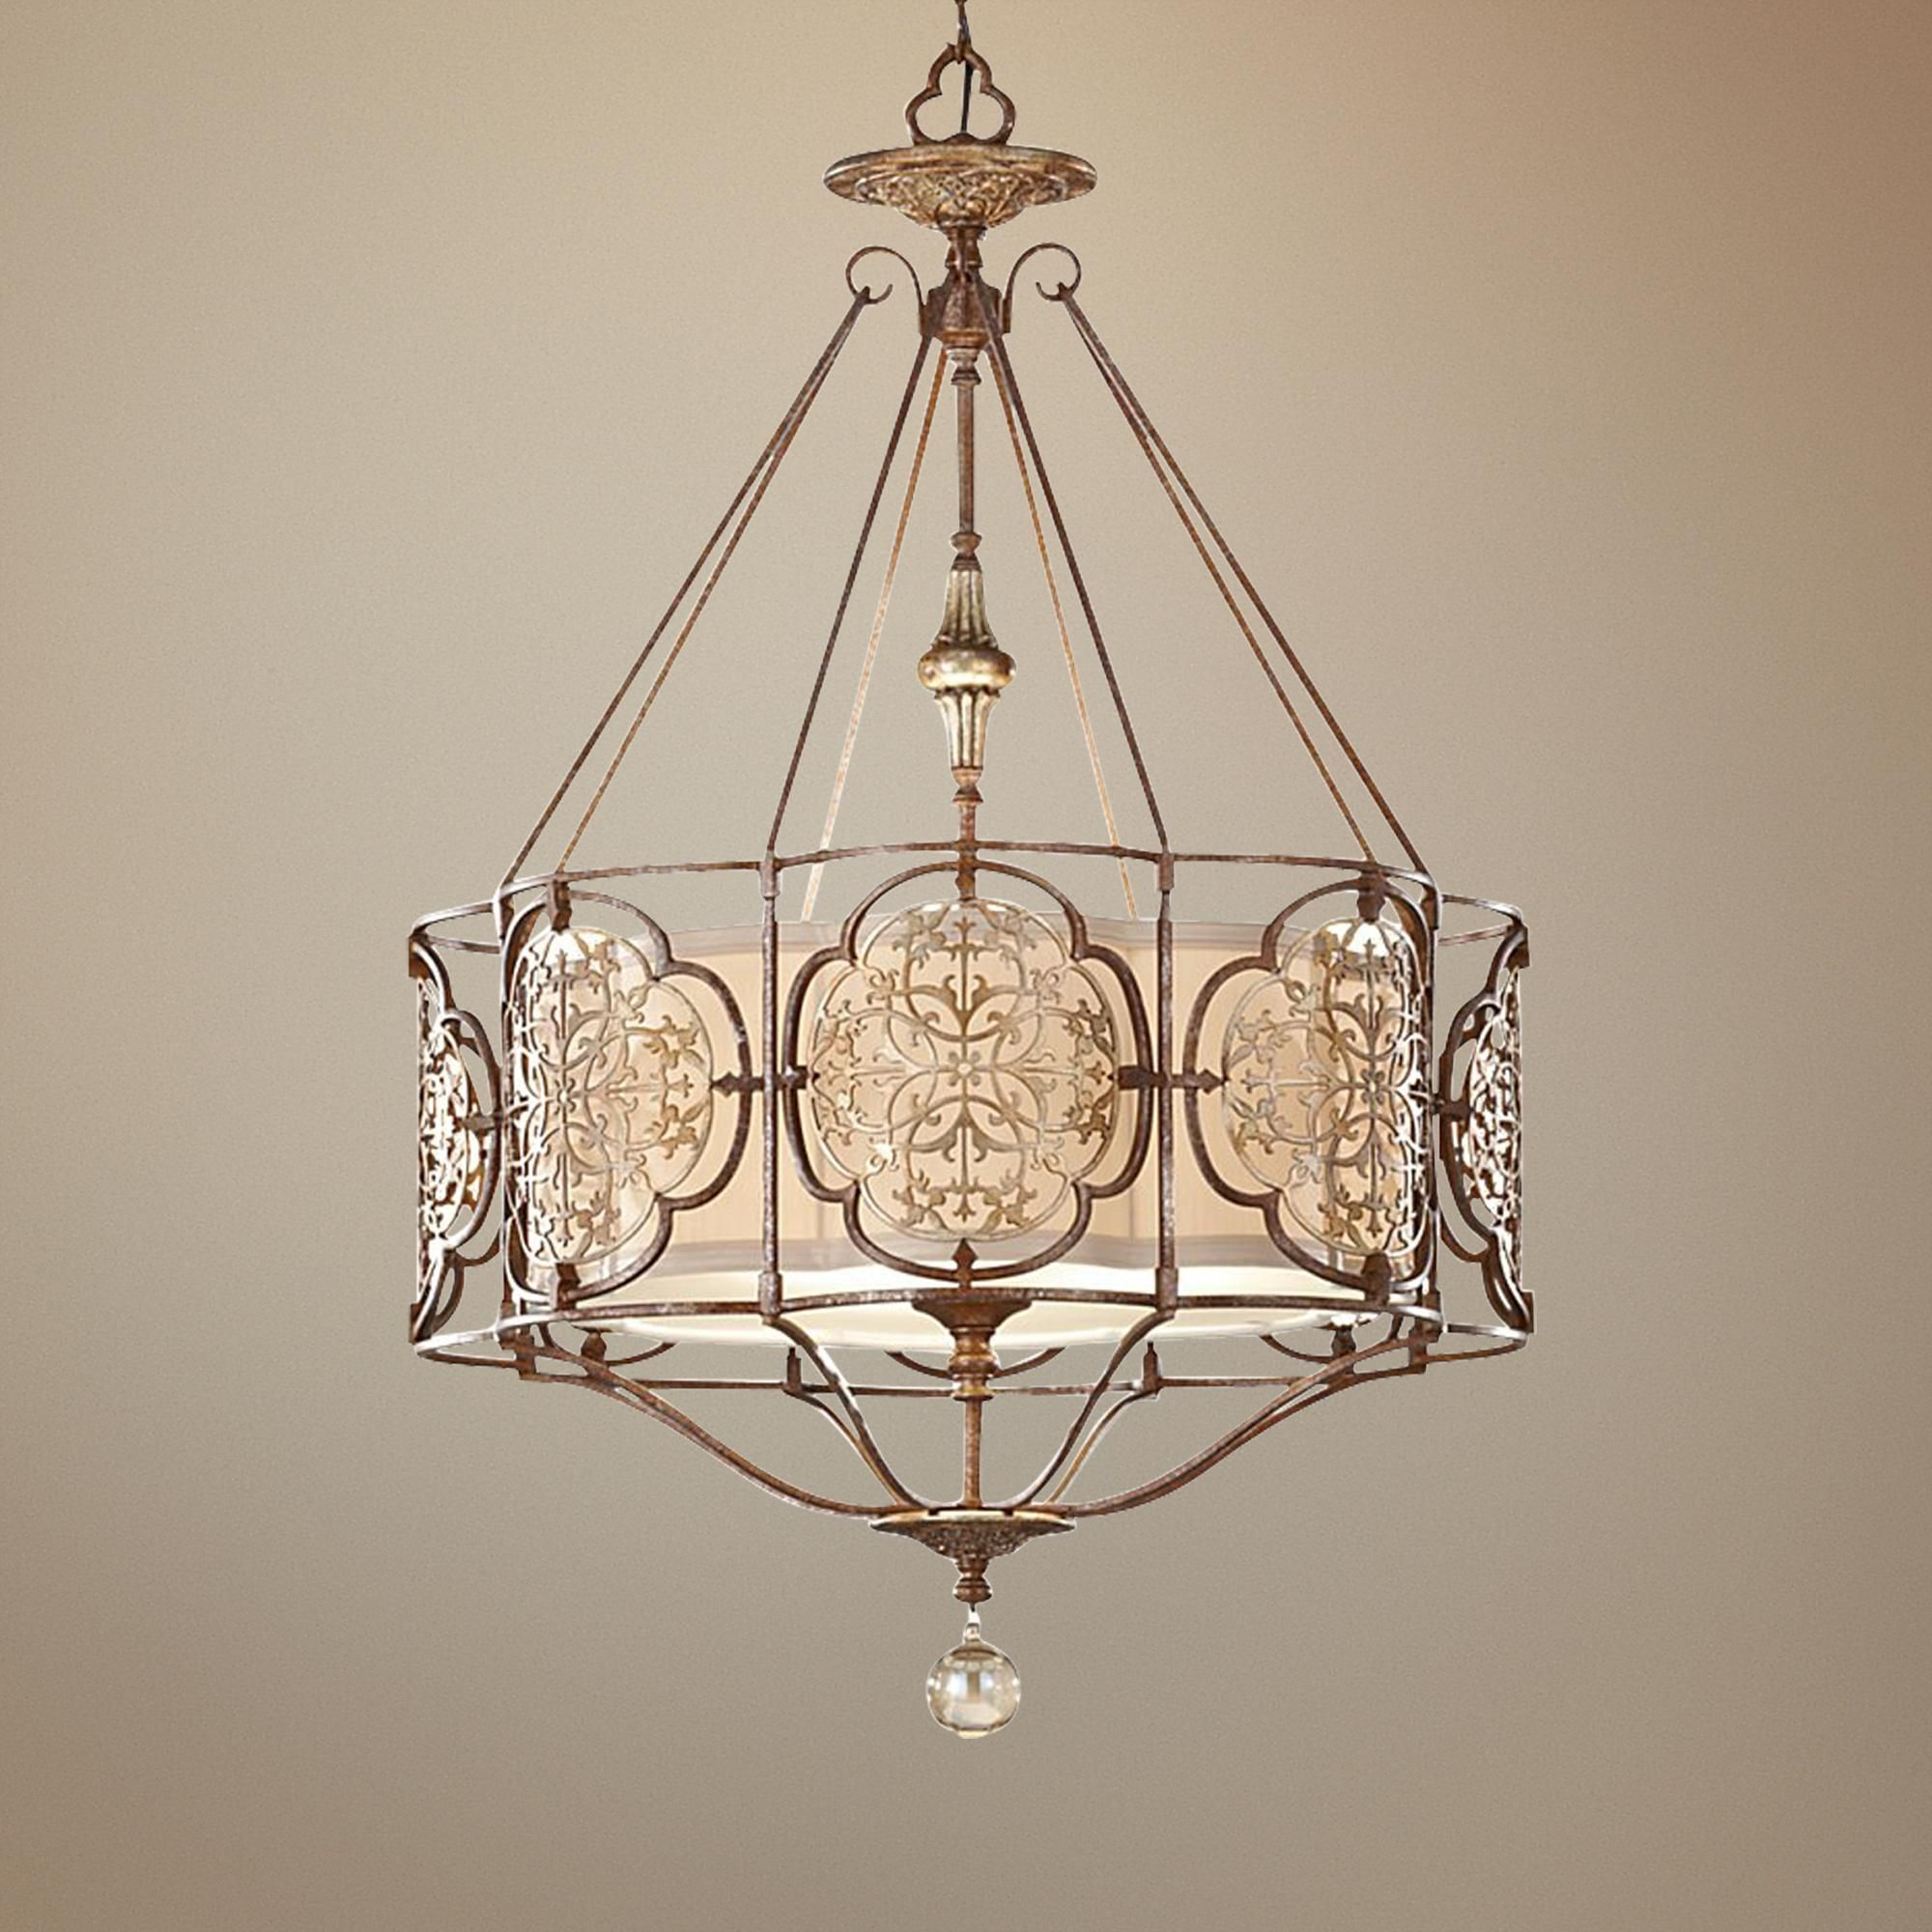 "Feiss Marcella 3-Light 21 1/4"" Wide Bronze Chandelier"